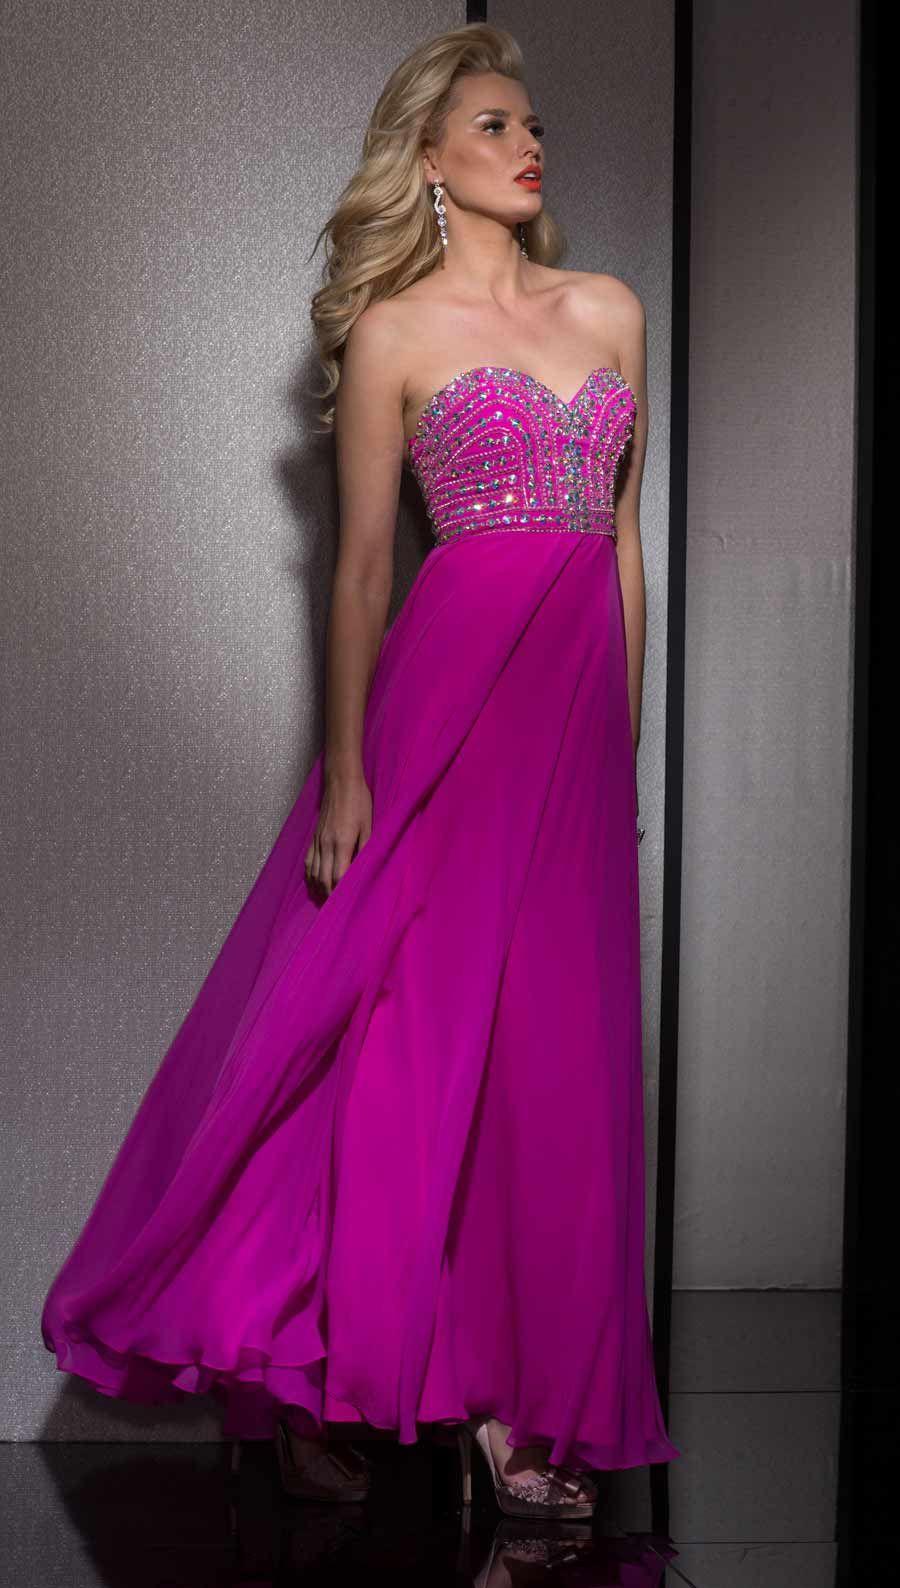 Clarisse Formal Long Prom Dress 2543 Promgirl Net Sweetheart Chiffon Dress Formal Dresses Gowns Evening Gowns Elegant [ 1588 x 900 Pixel ]